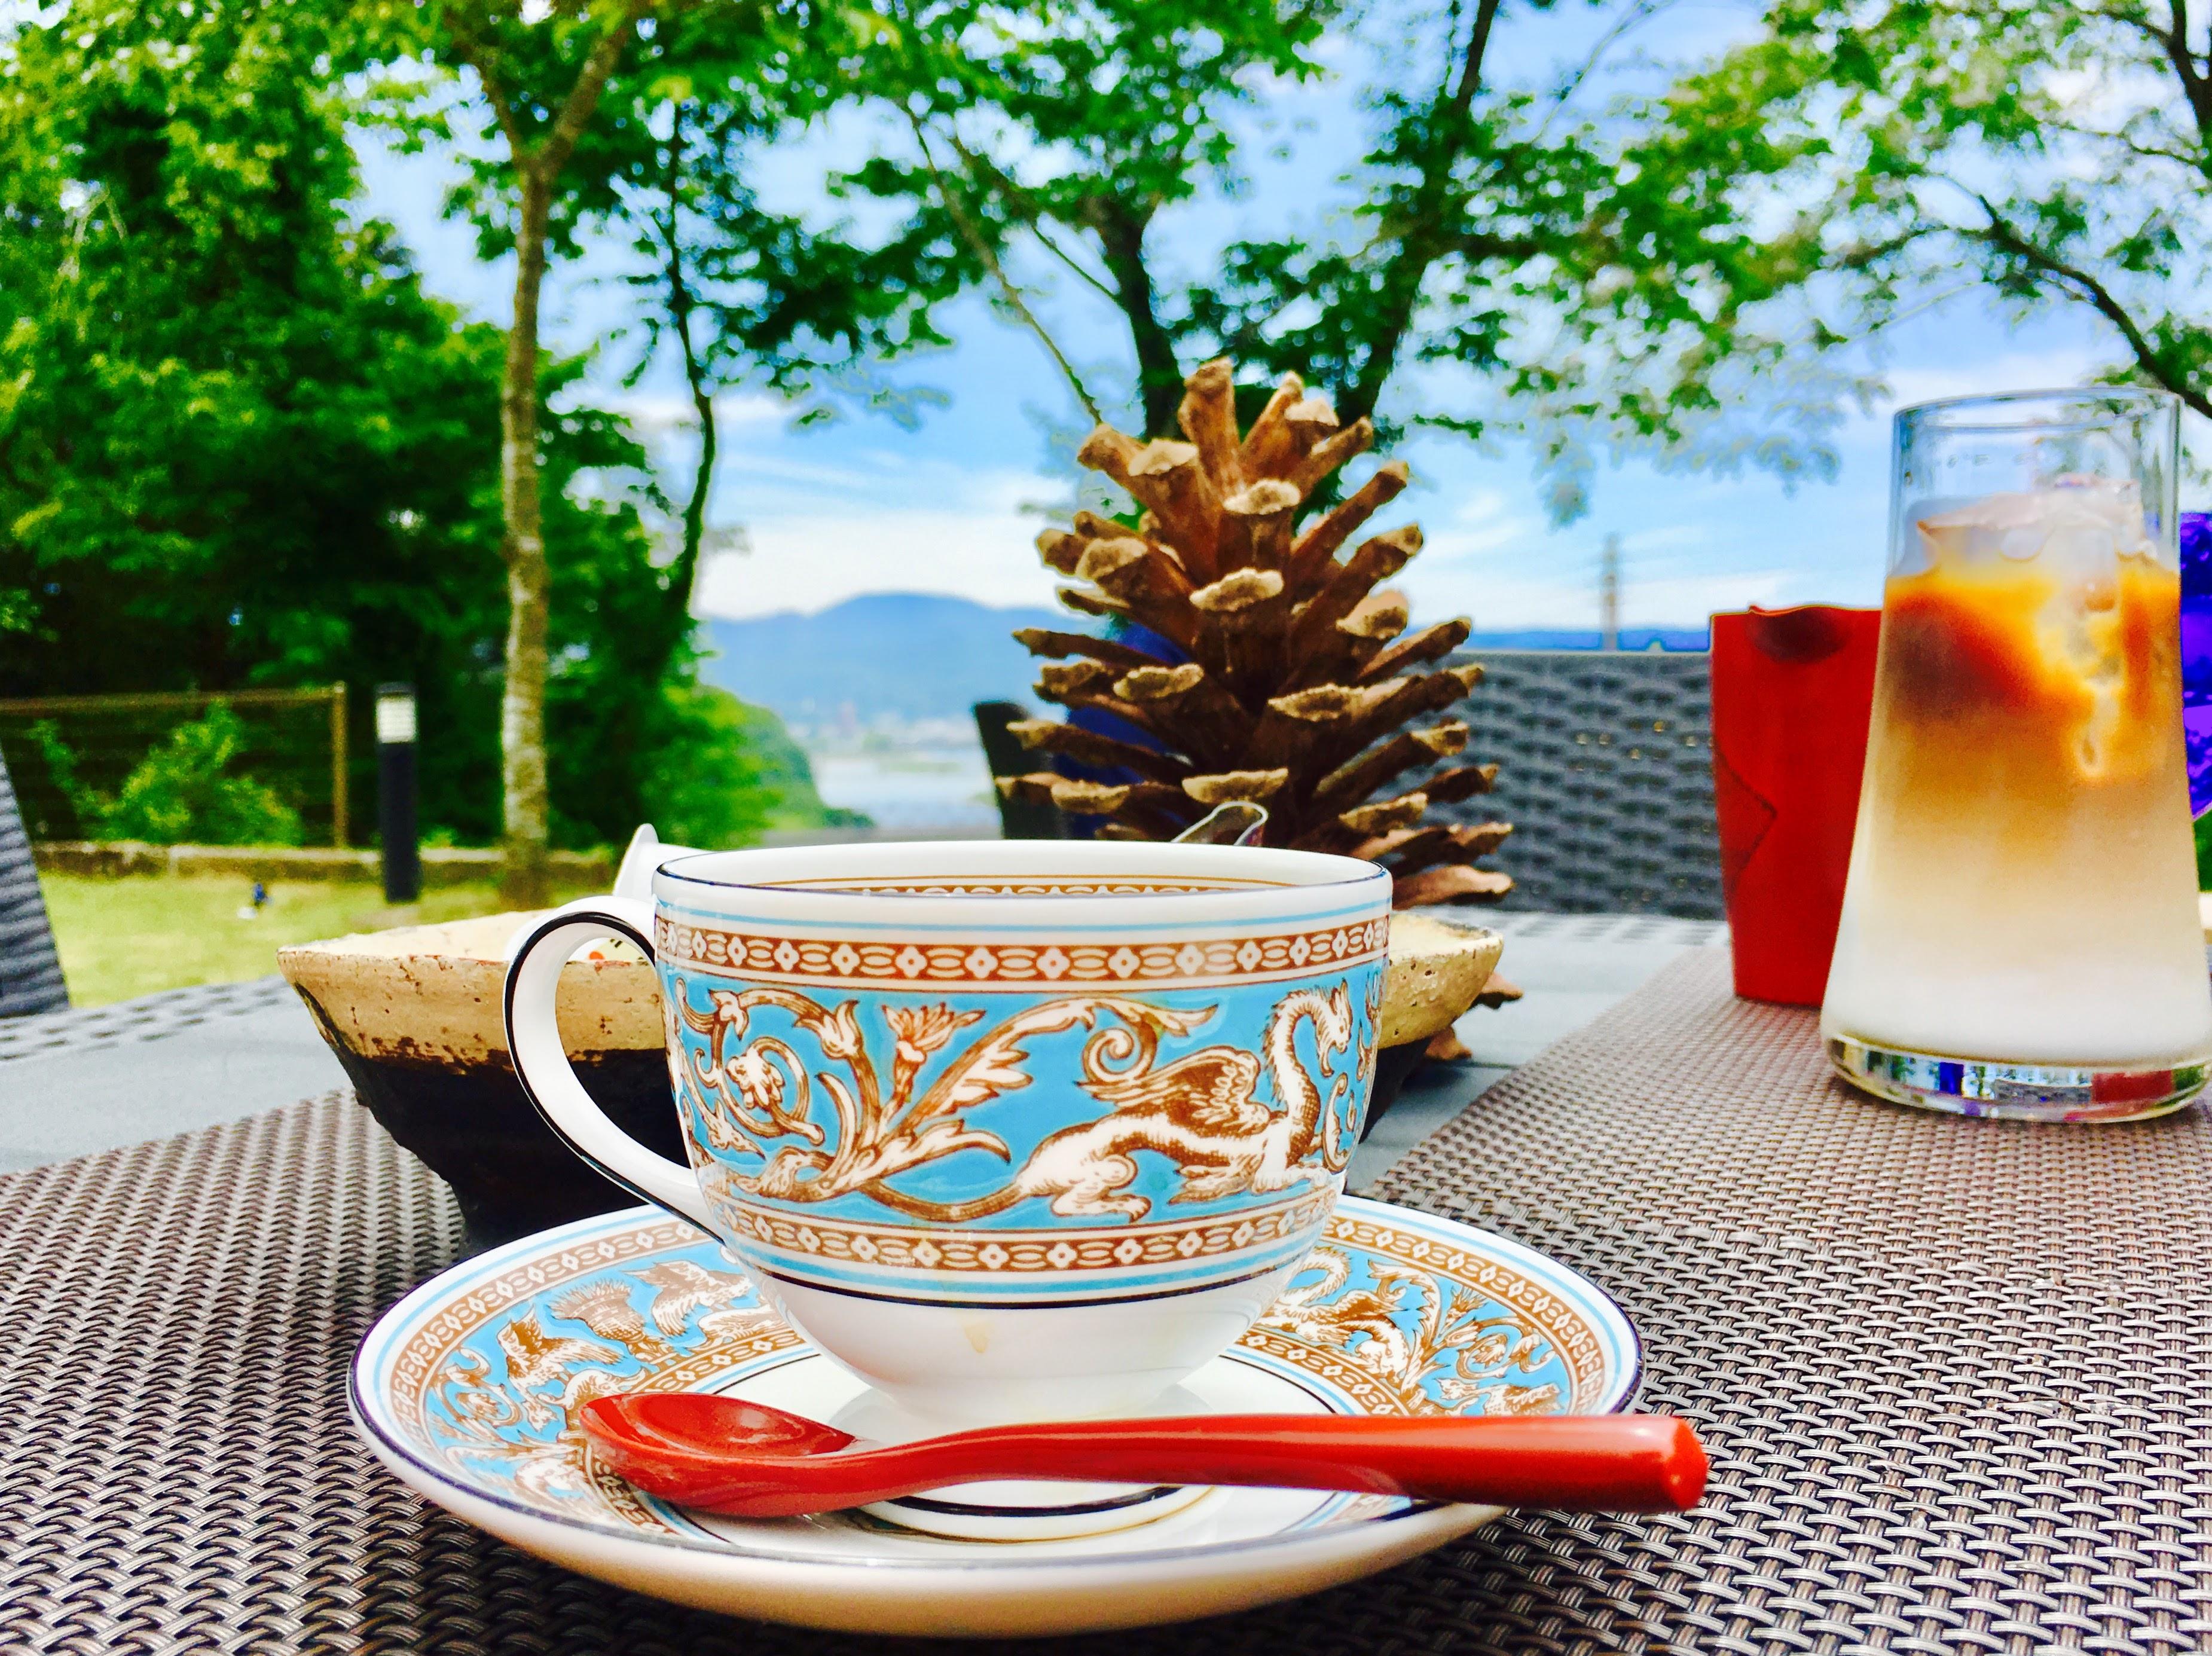 【Kura-倉Cafe (クラくらカフェ)】人吉・球磨川を見下ろしながら贅沢なティータイムを